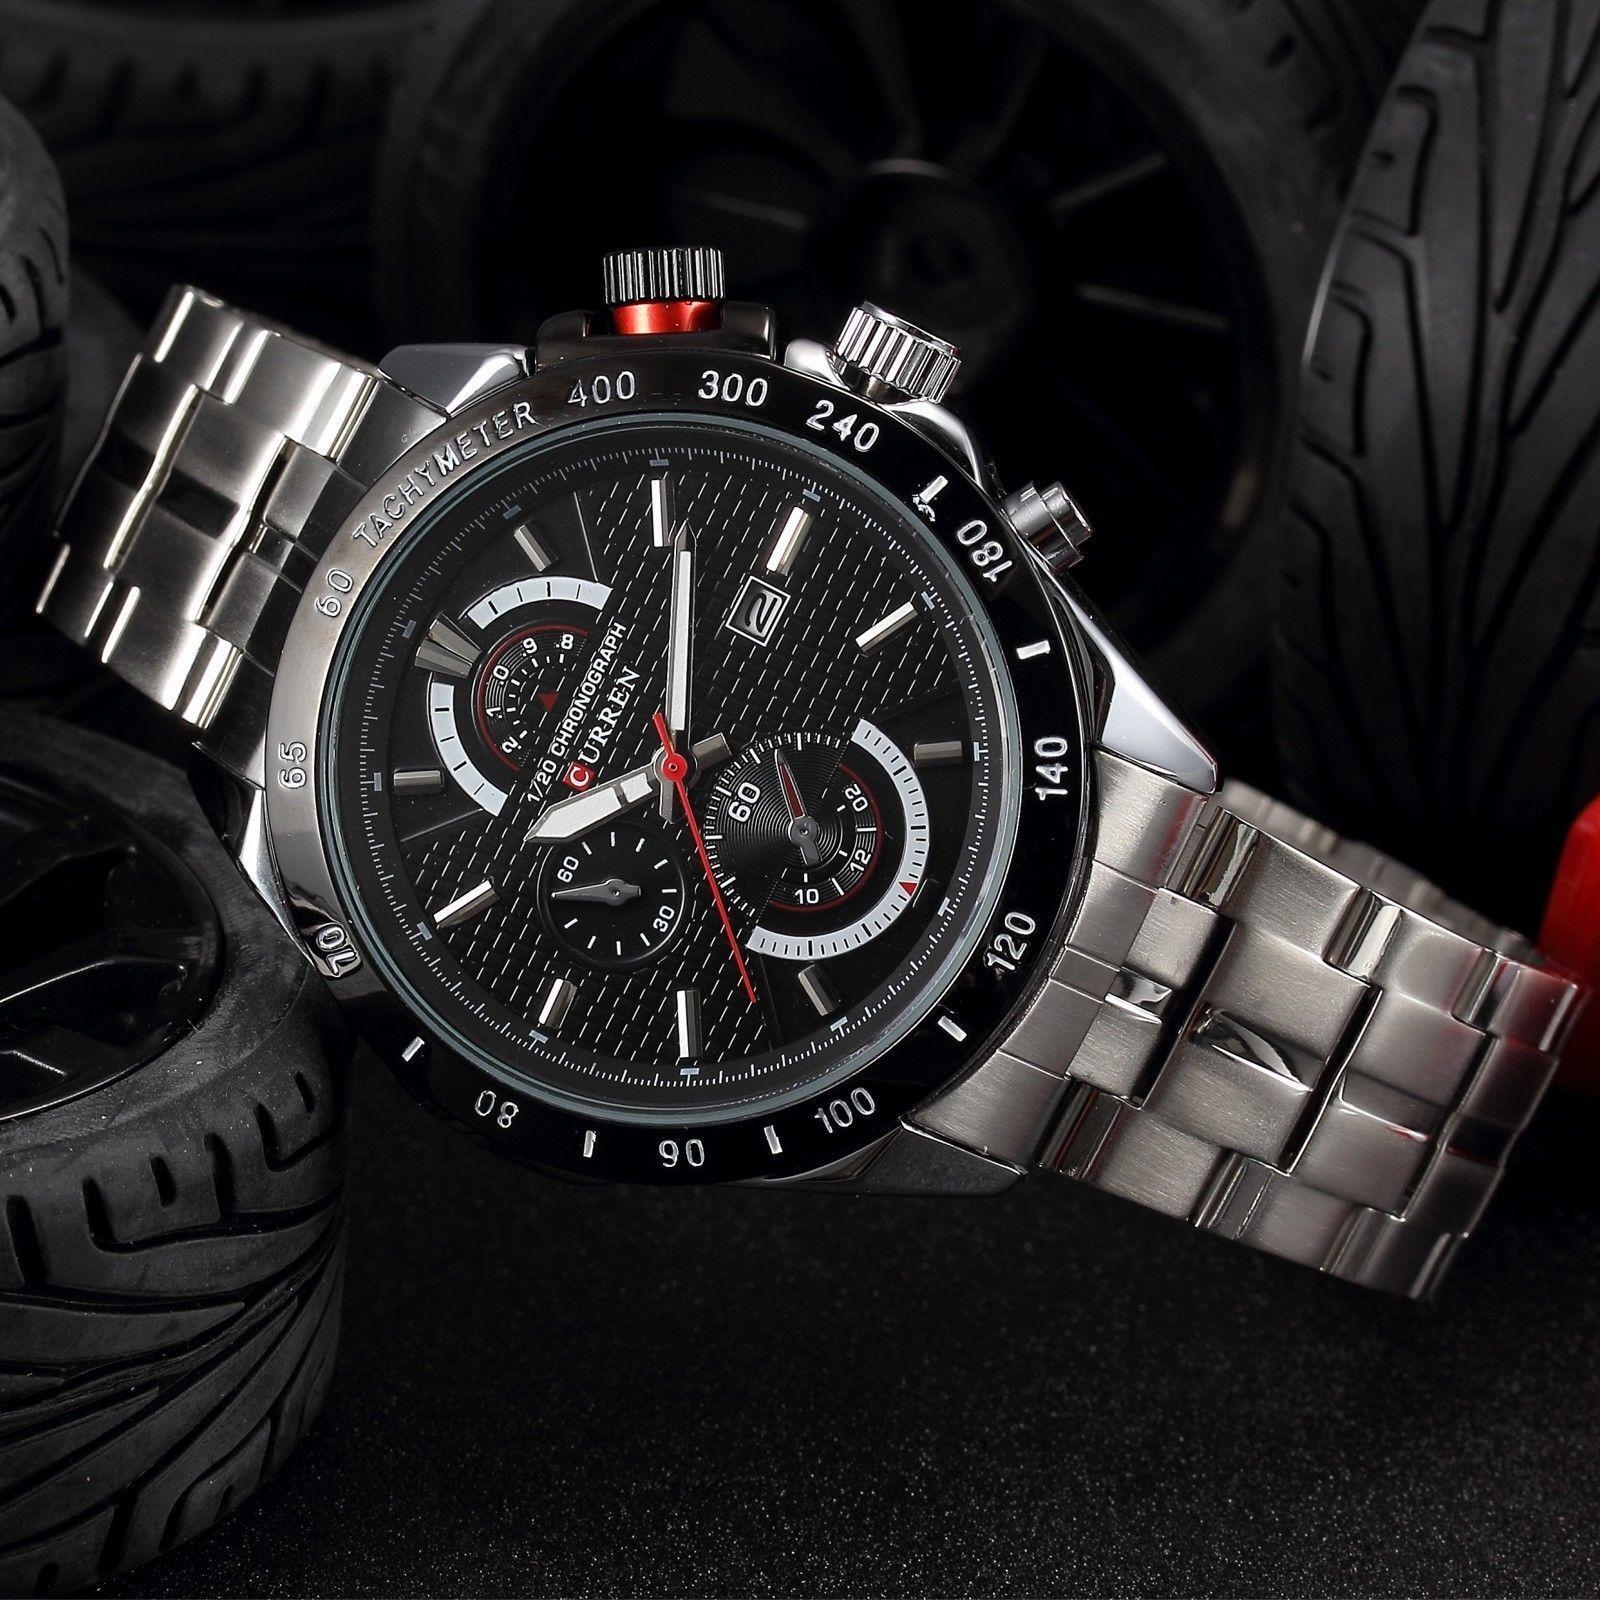 $12.99 - CURREN Luxury Men's Analog Quartz Date Stainless Steel Waterproof Wrist Watch